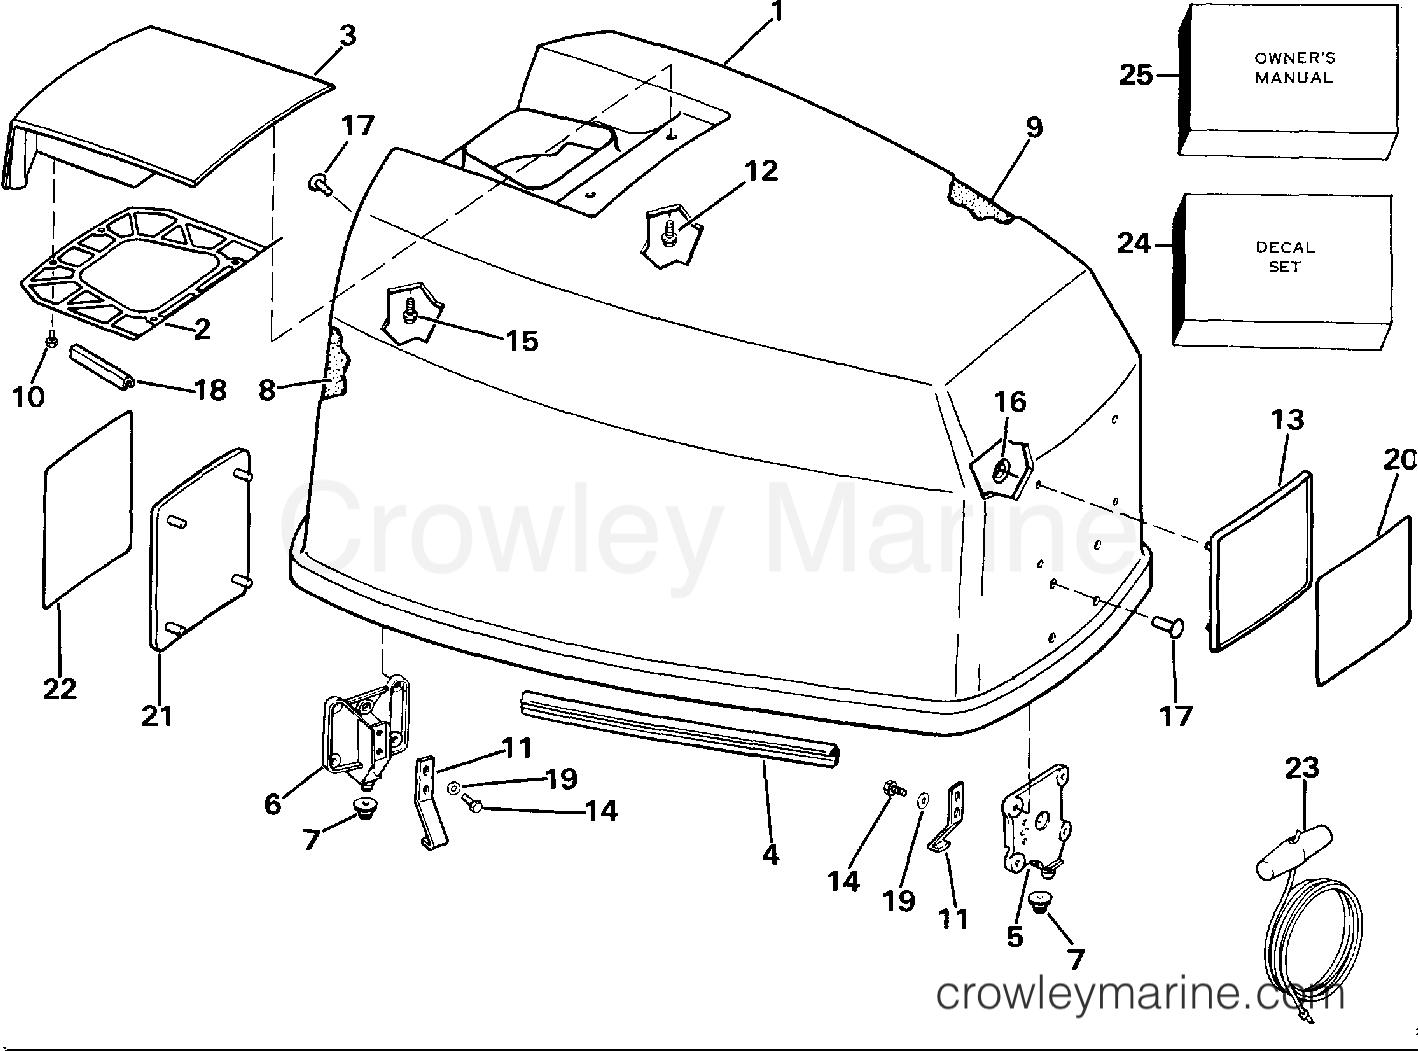 Engine Cover - Johnson